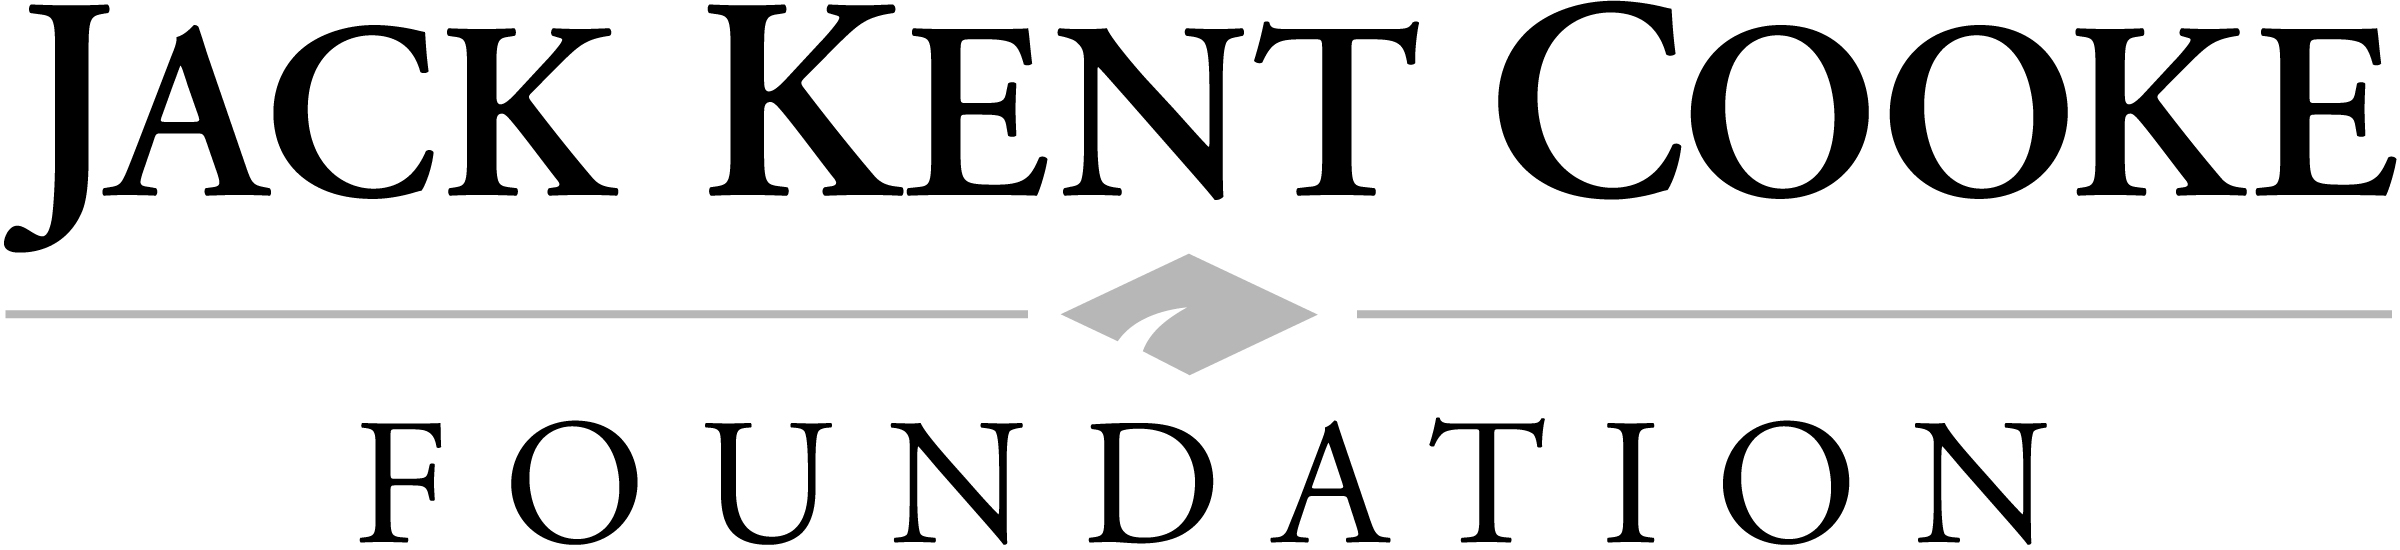 Jack Kent Cooke logo